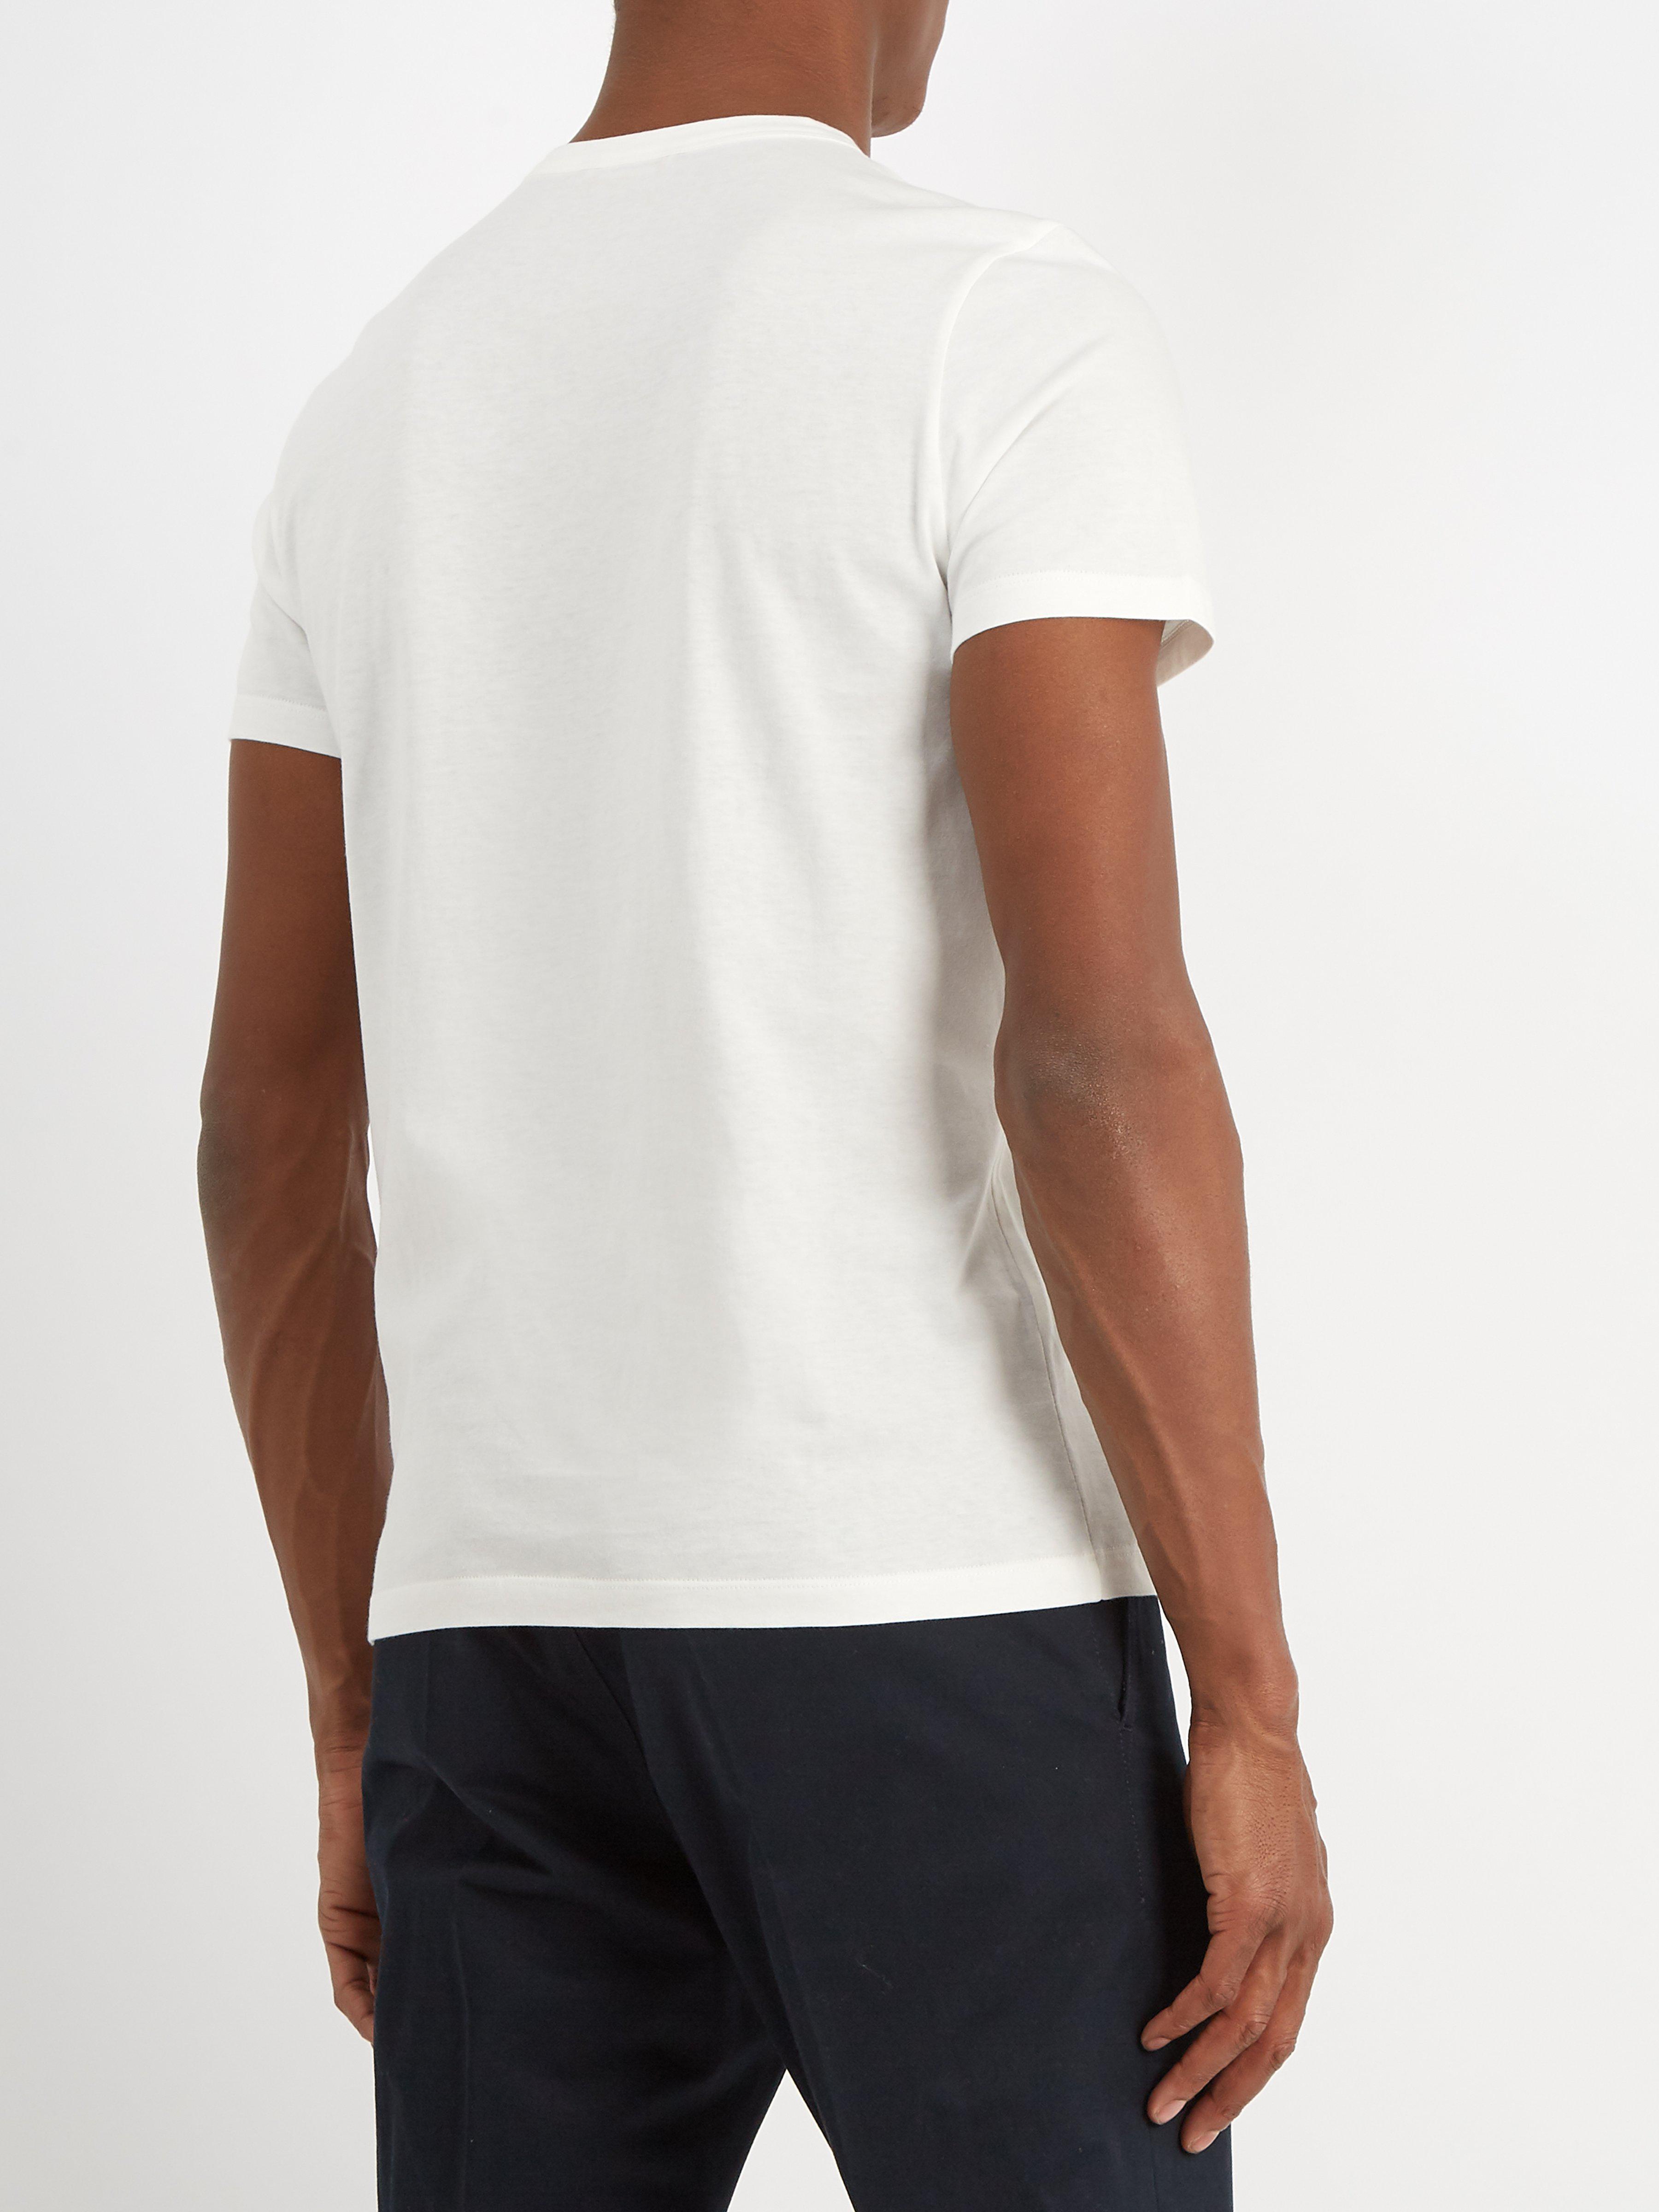 e3d00d23ce8d White For T View Shirt Fullscreen Cotton Men Stripe Lyst Print ...